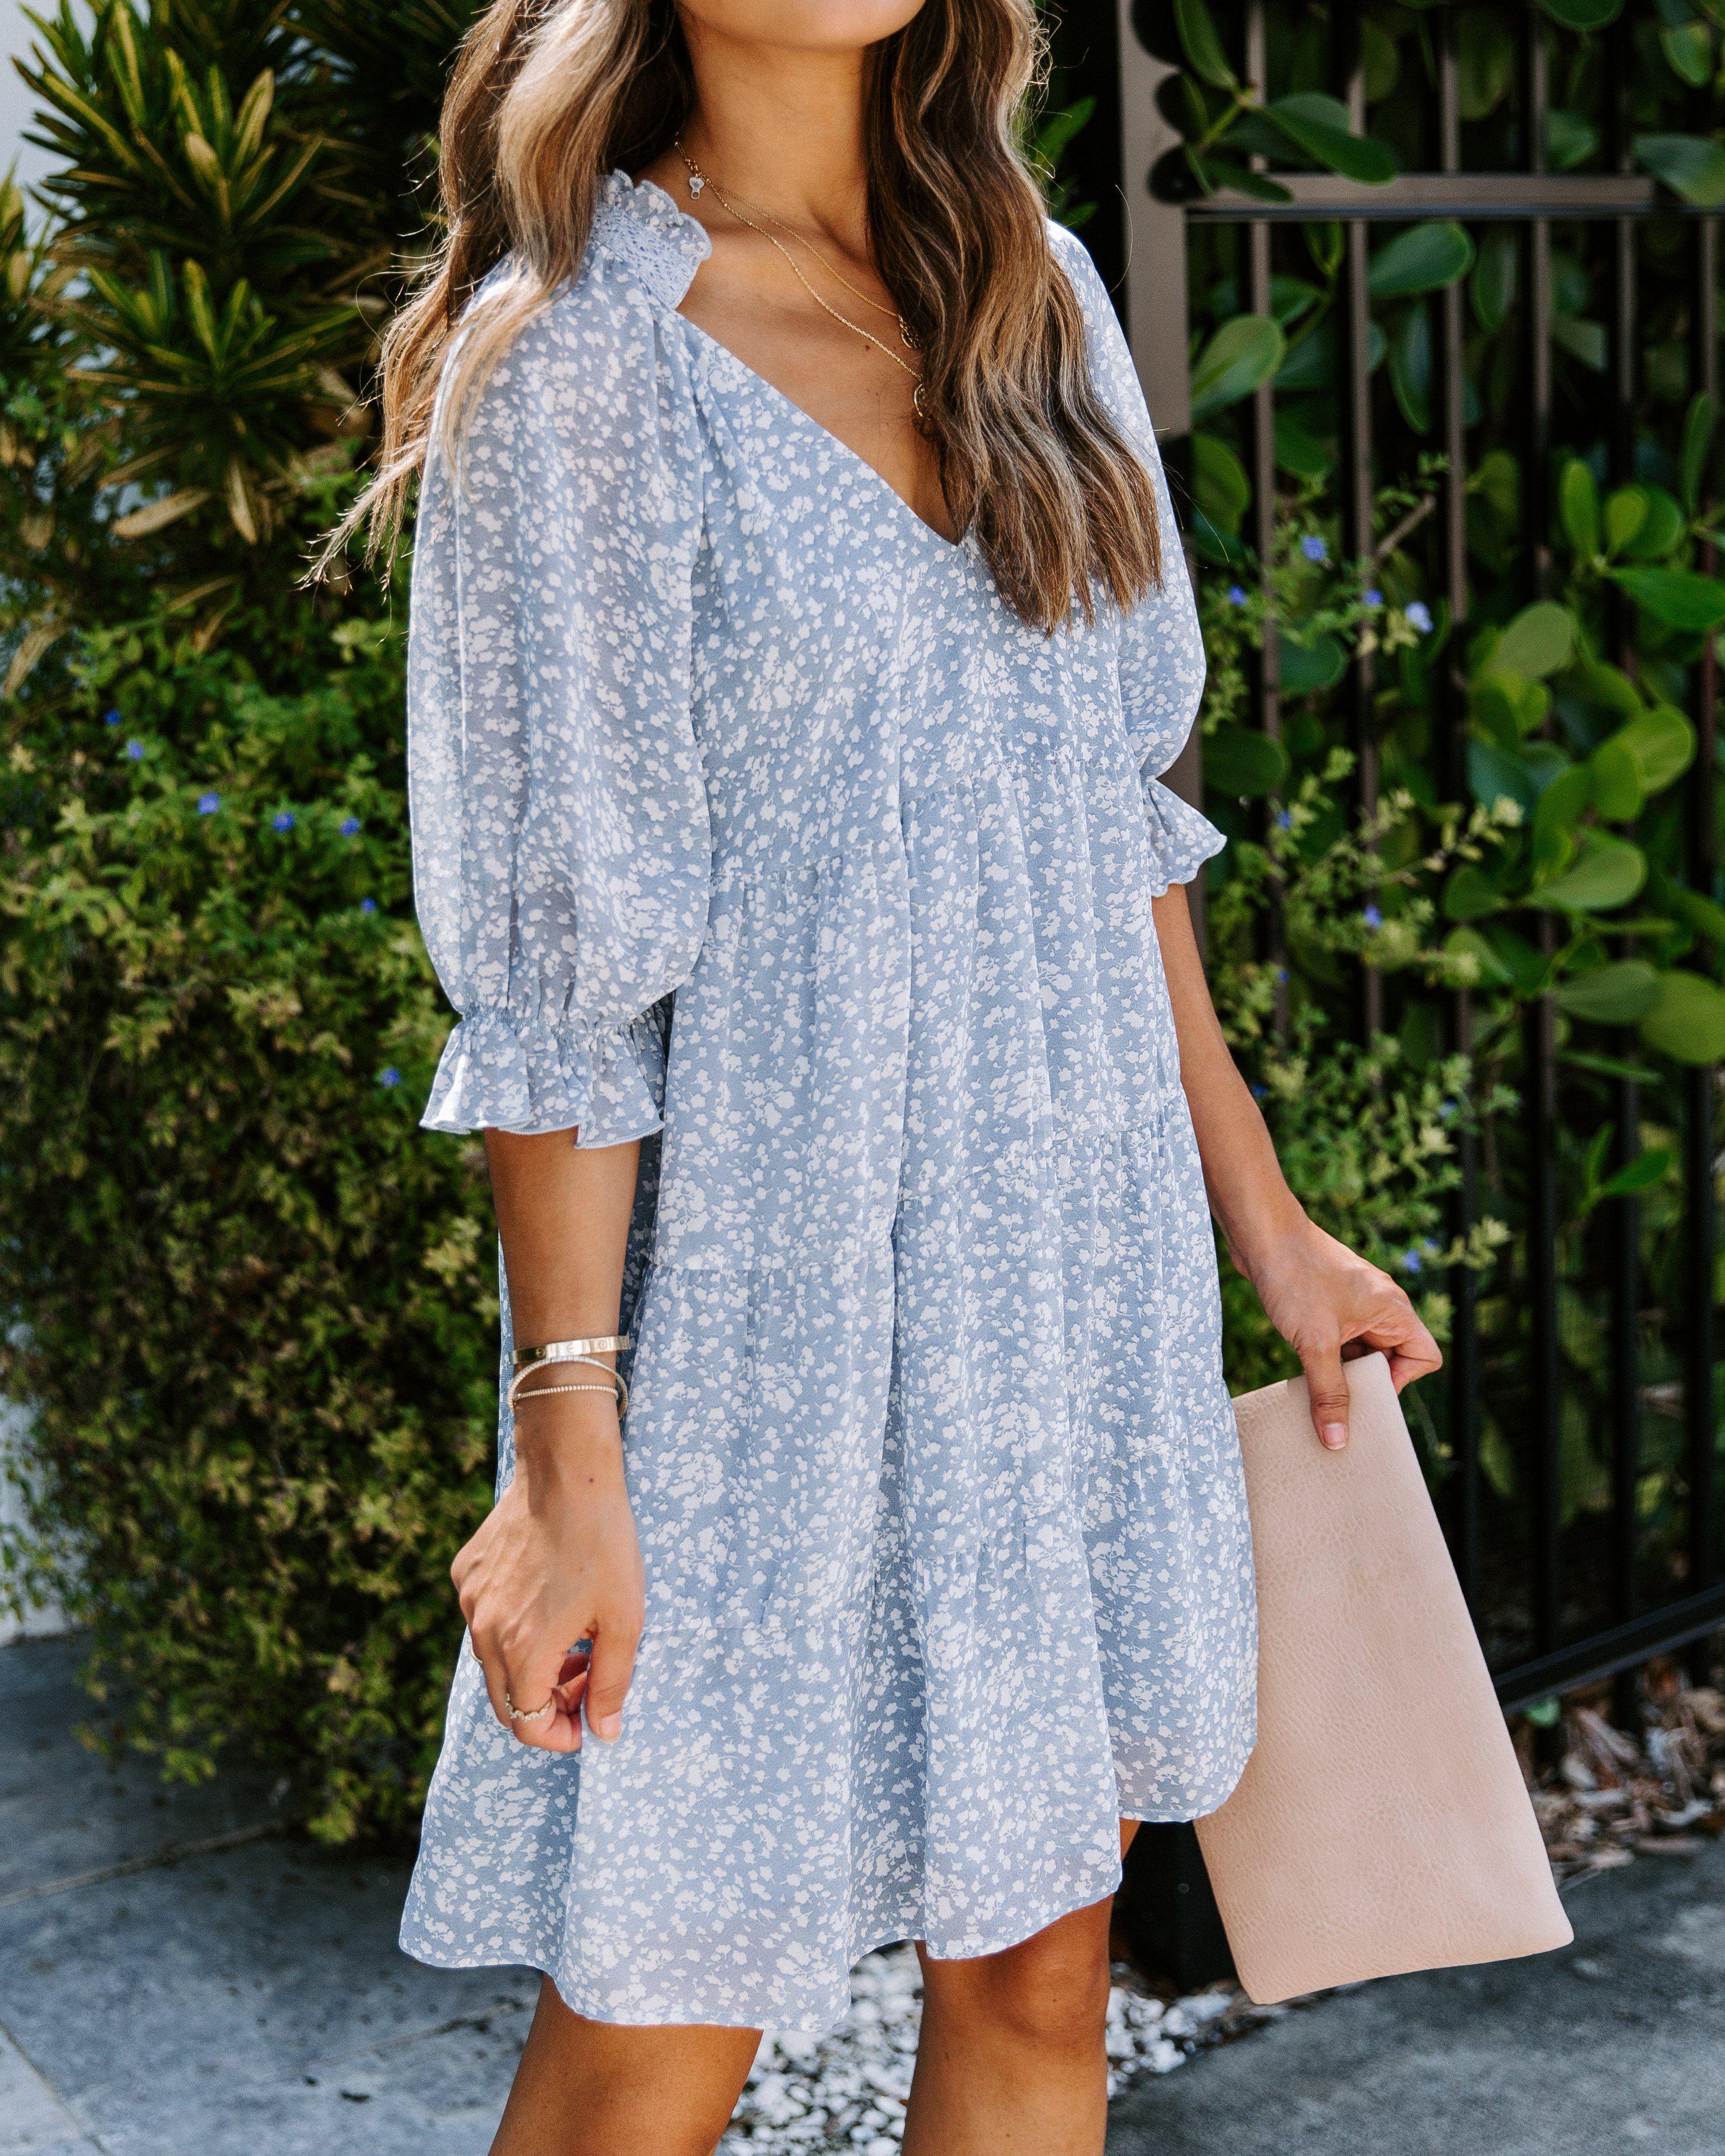 Rhonda Printed Tiered Dress Vici Tiered Dress Casual White Dress Dresses Casual Boho [ 4001 x 3201 Pixel ]